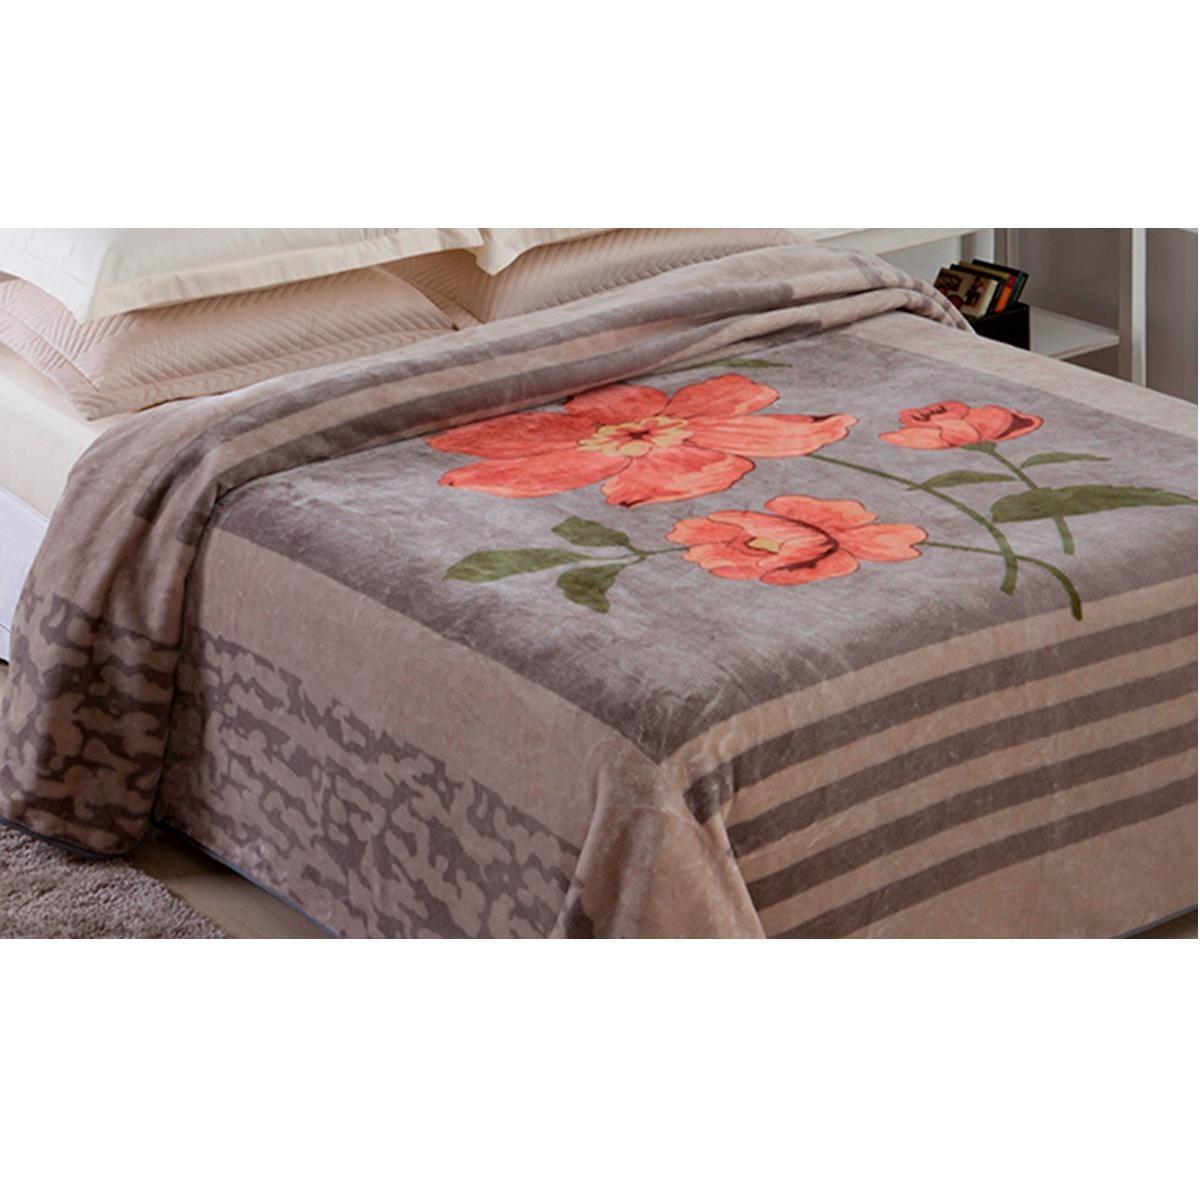 77464bcd02 cobertor casal king jolitex raschel 220x240. Carregando zoom.